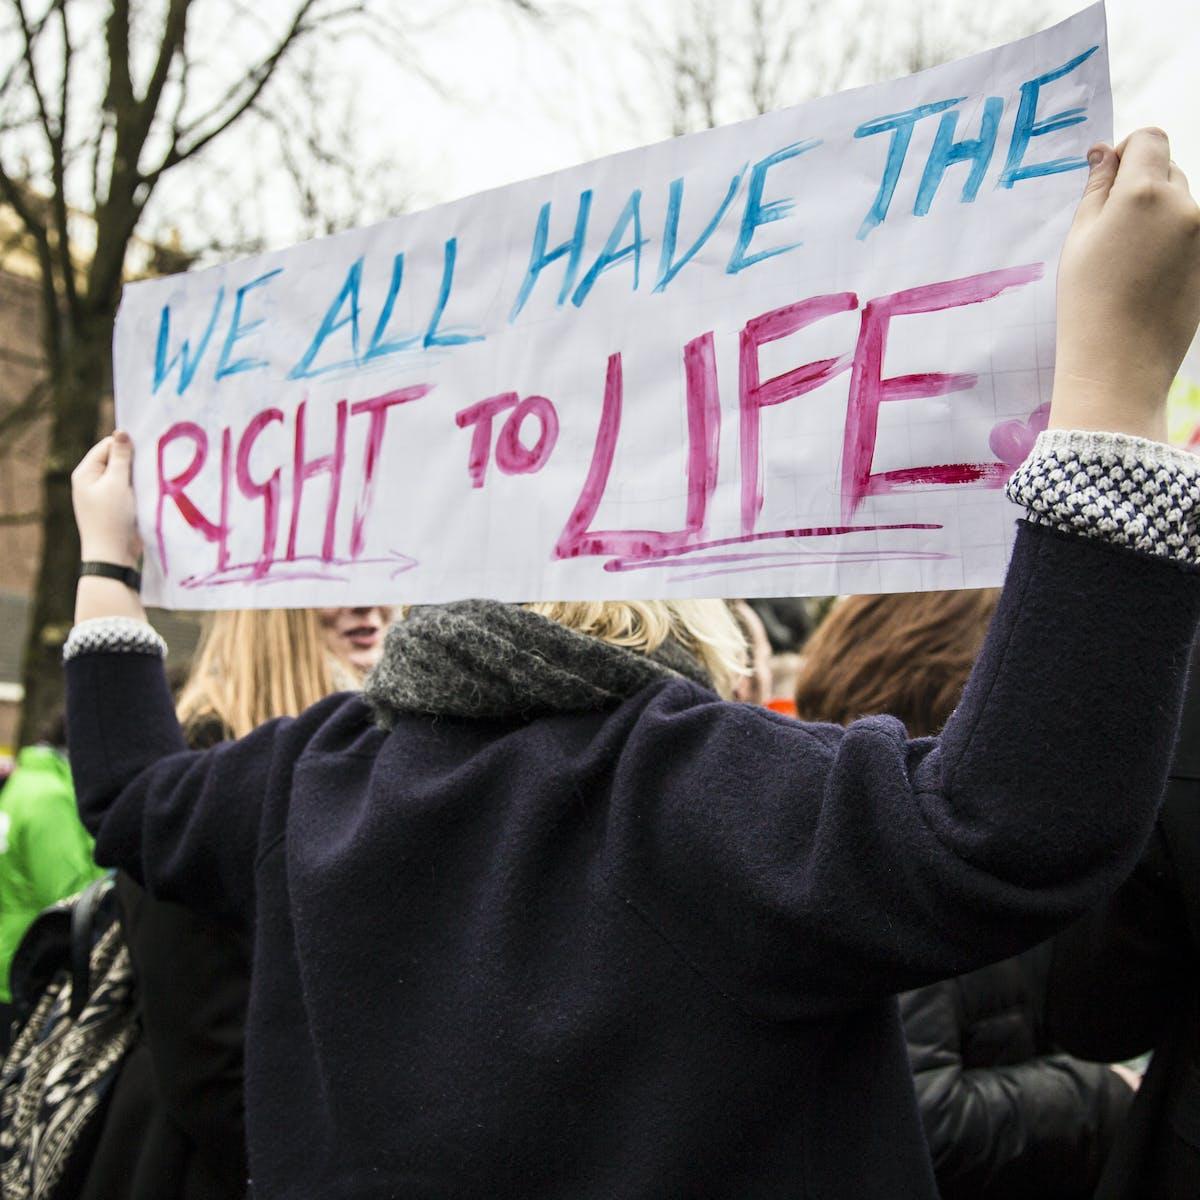 So much for Dutch tolerance: life as an LGBT asylum seeker